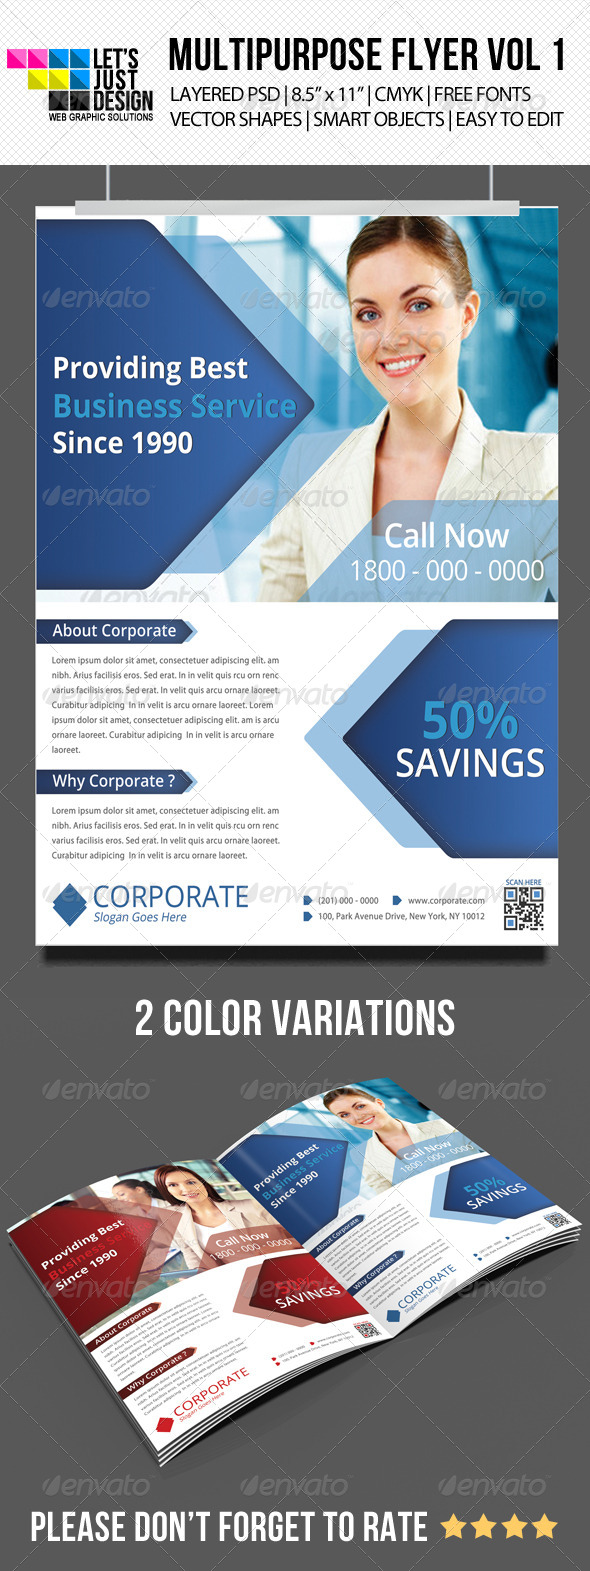 Multipurpose Corporate Flyer Vol 5